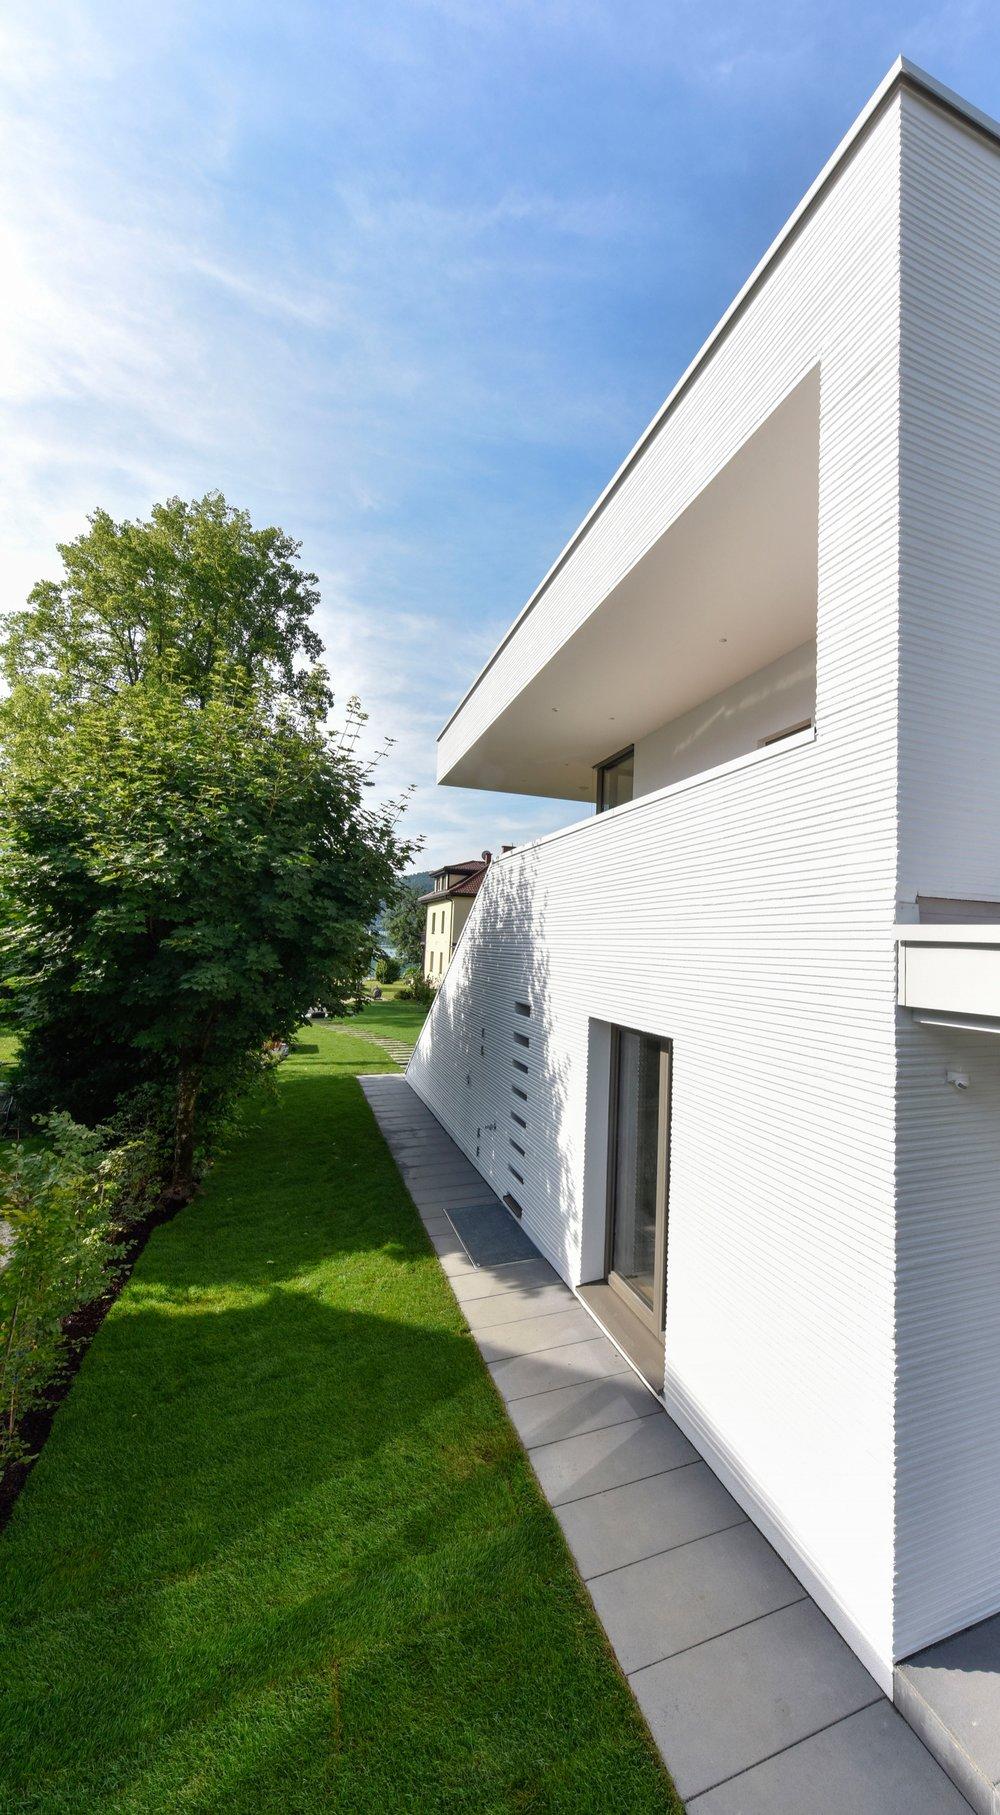 A01 architects - Residence Krumpendorf_(c) Hannes Kohlmeier__web10